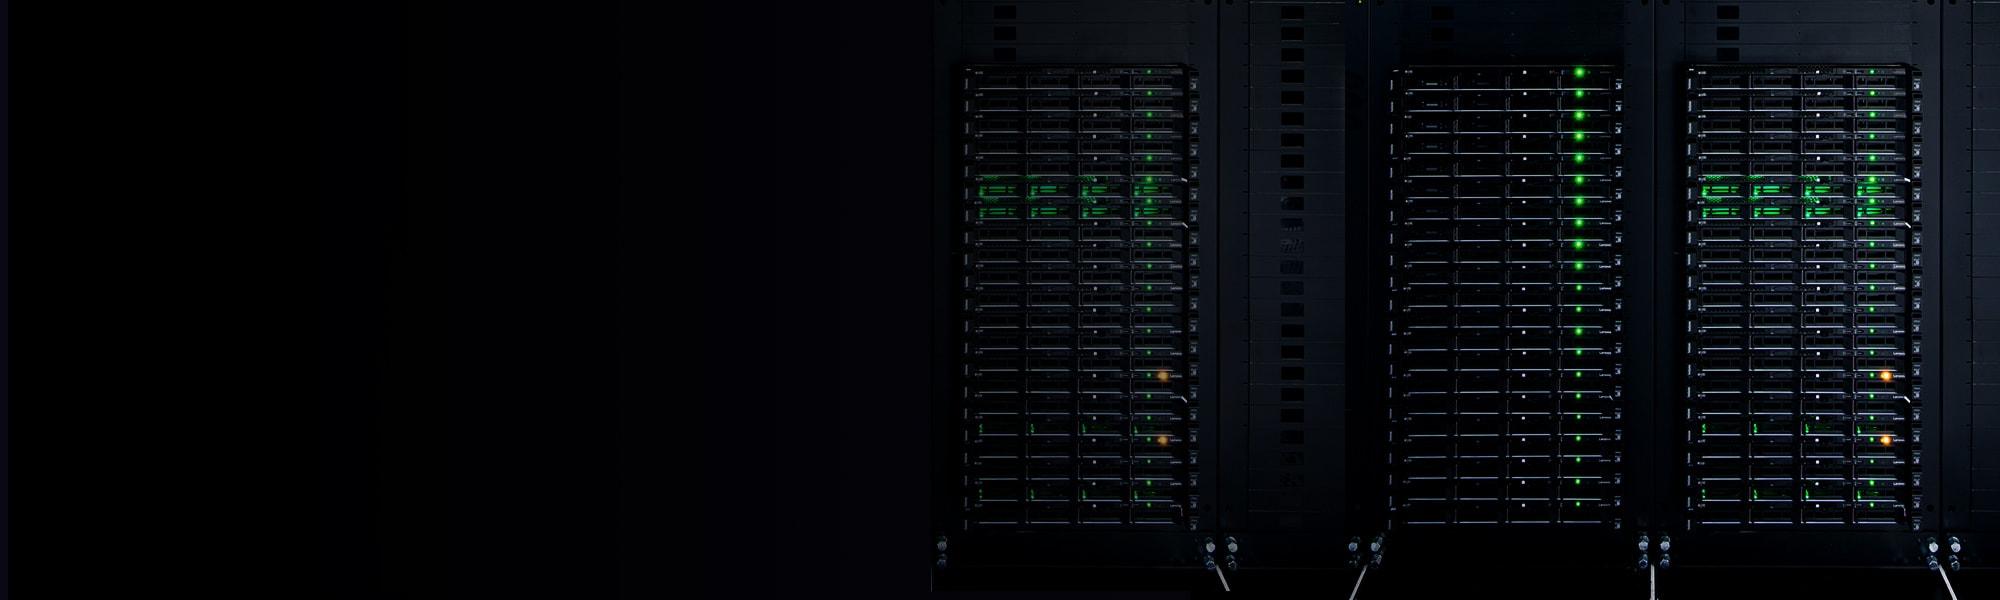 как установить зомби сервер на хостинг